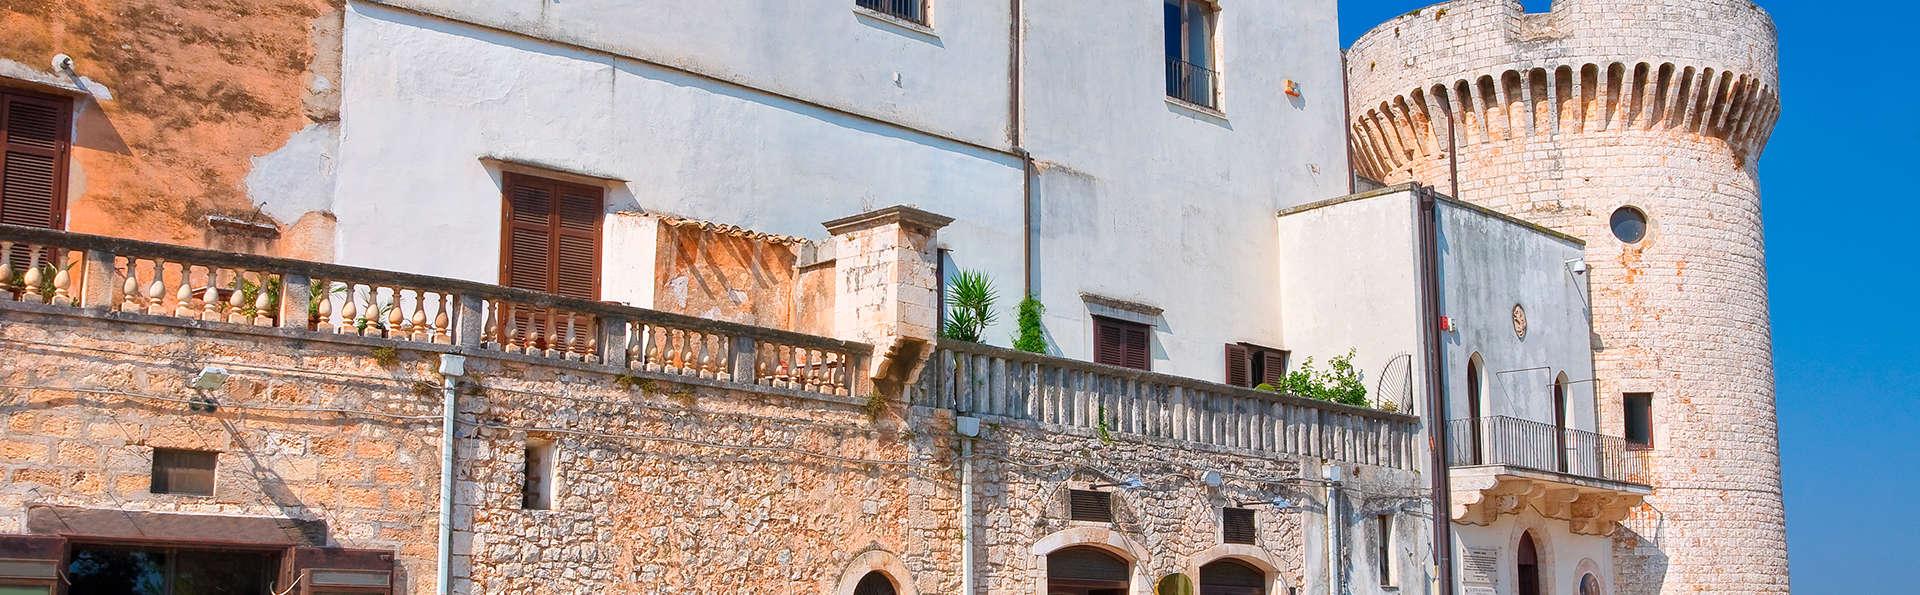 D'Aragona Grand Hotel  - edit_conversano6.jpg